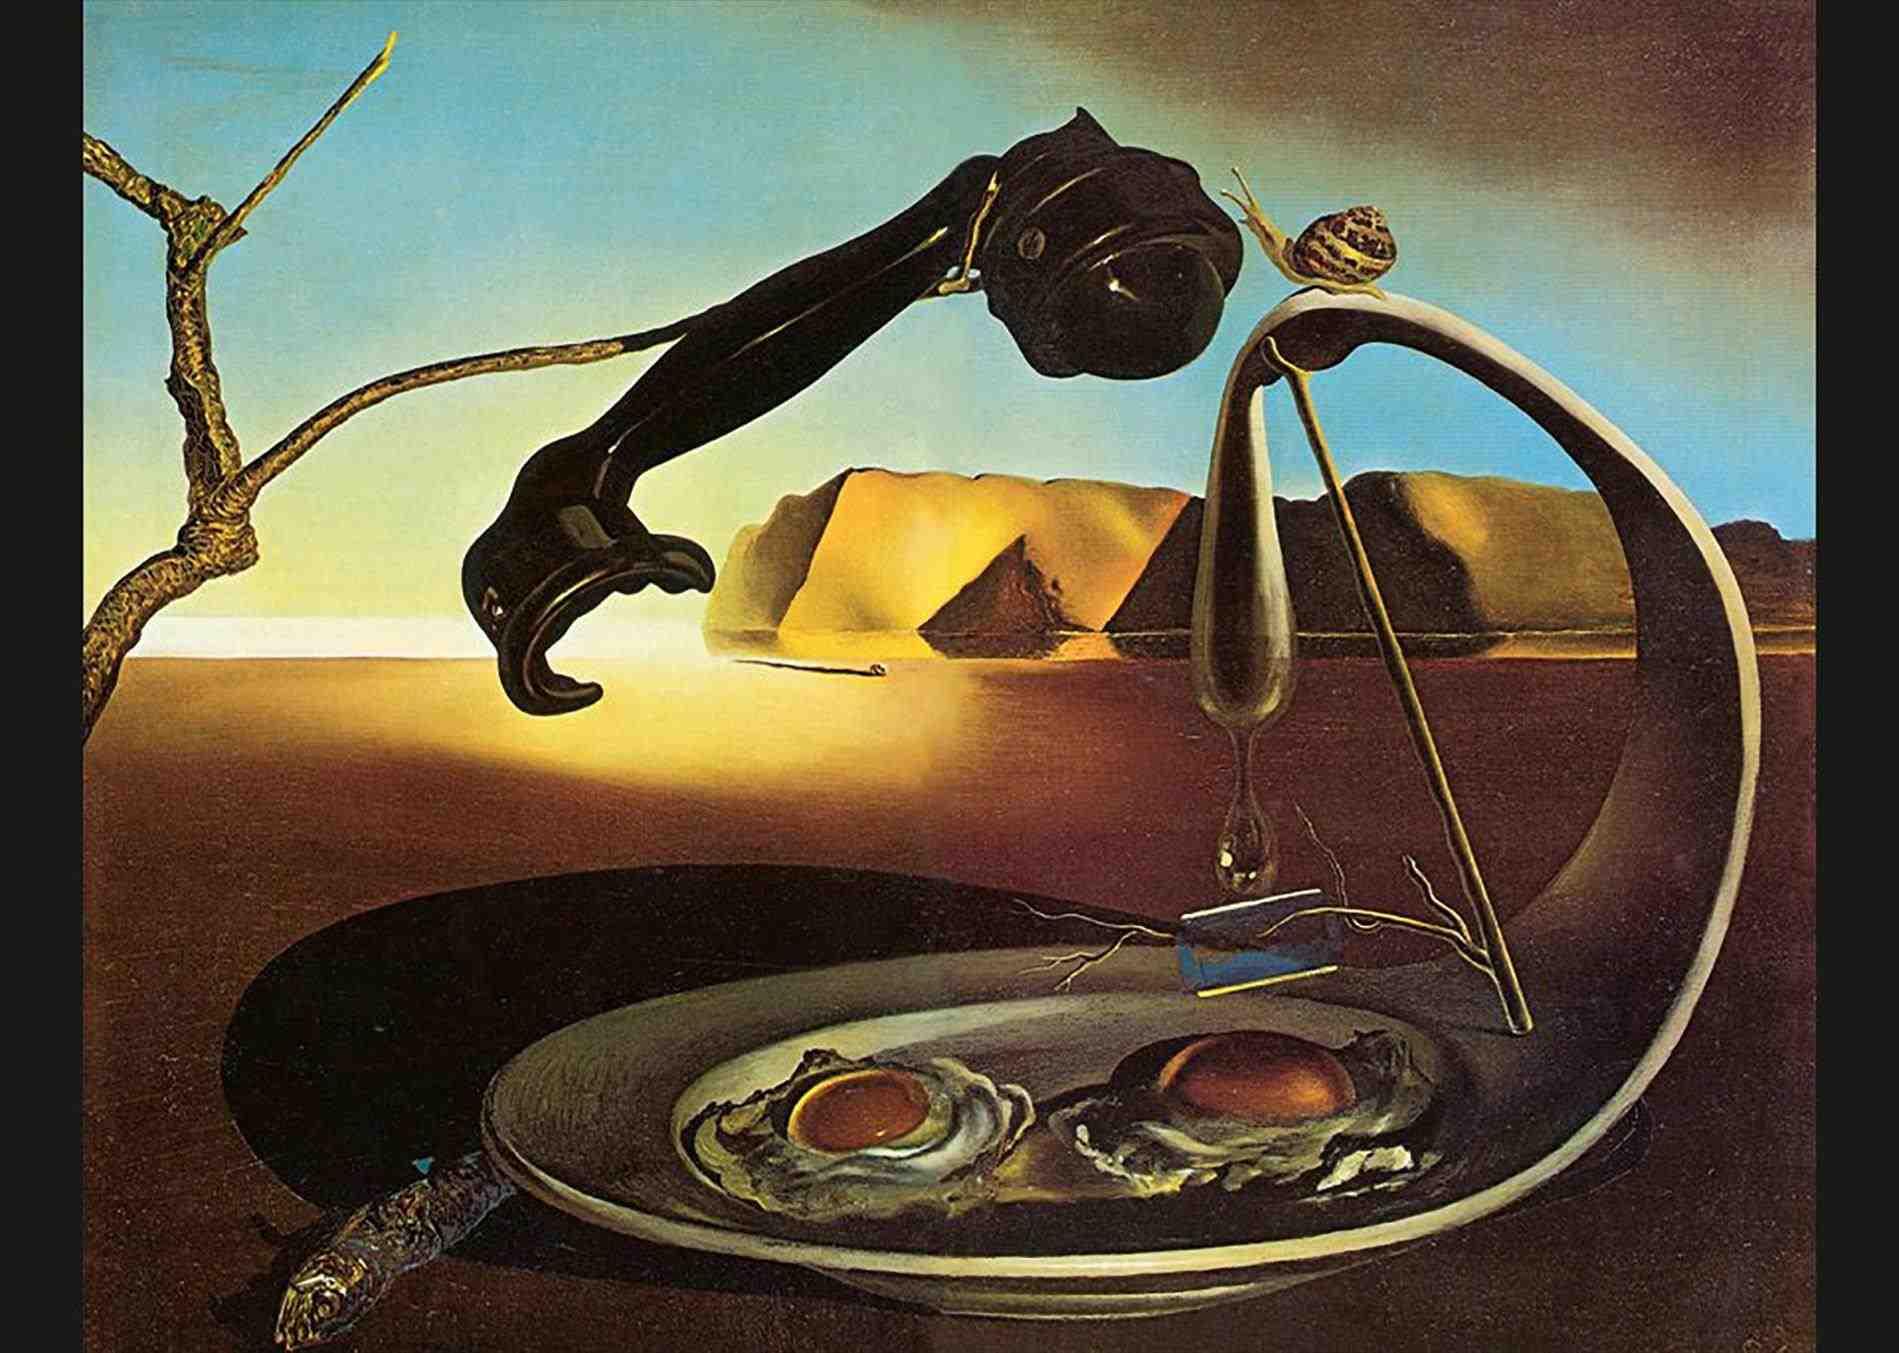 Masturbator Salvador Dali Wikiartorg The Surrealism Painting Dali ...